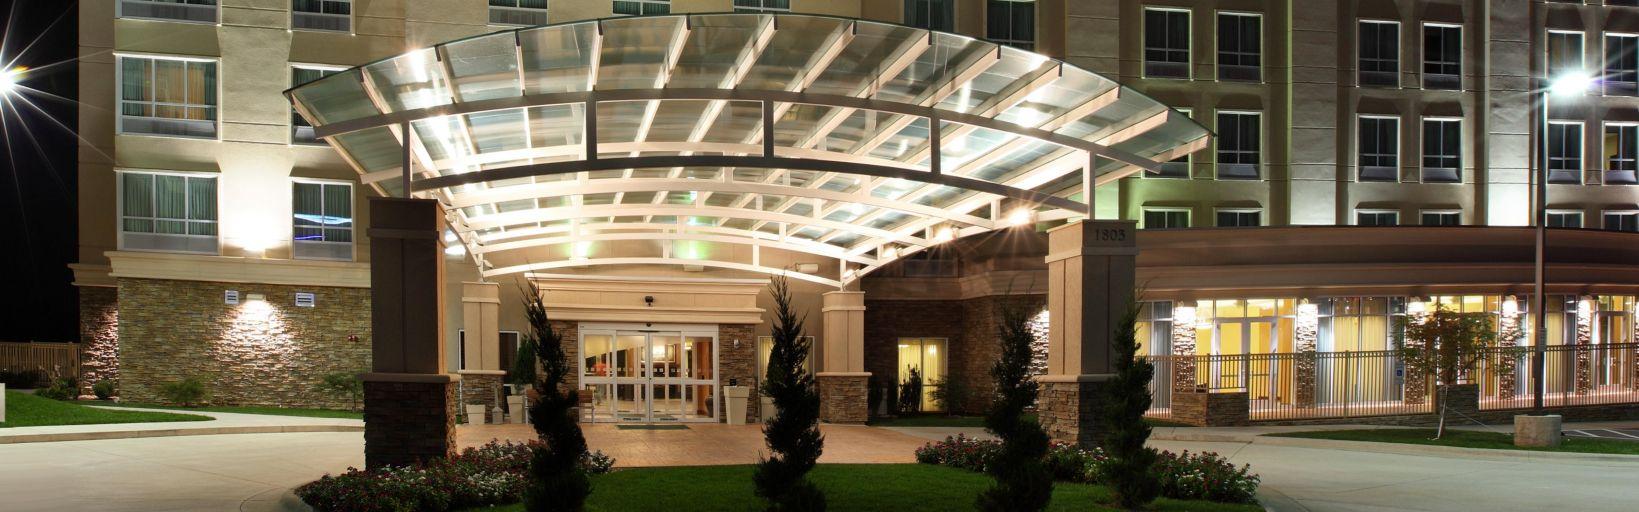 Holiday Inn Hotel & Suites Rogers - Pinnacle Hills Hotel by IHG